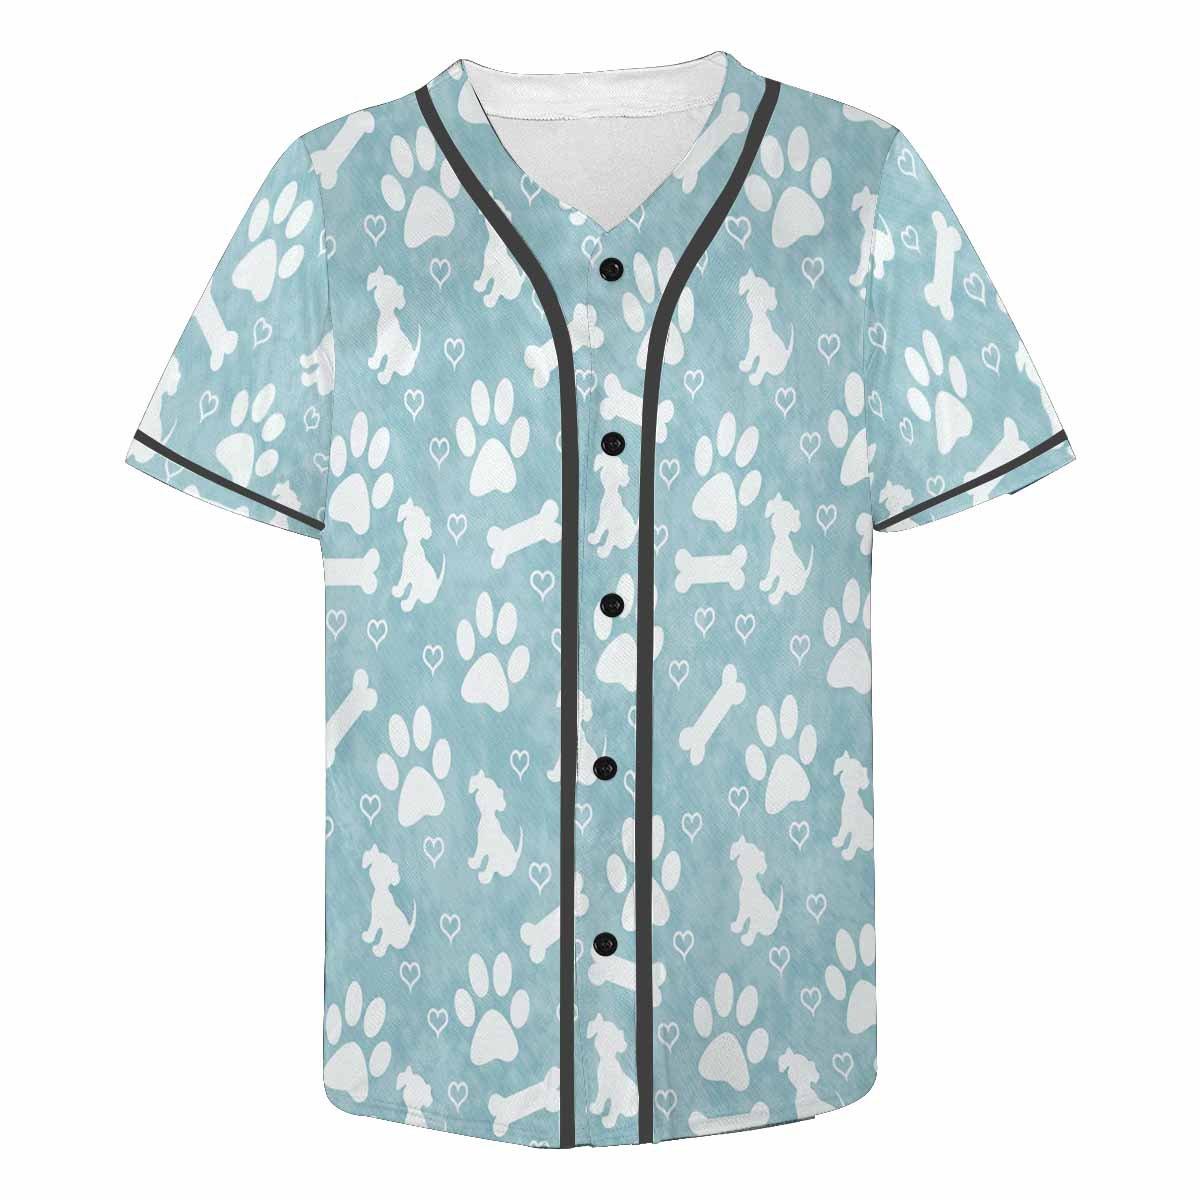 INTERESTPRINT Mens Button Down Baseball Jersey Dog Paw Prints and Hearts